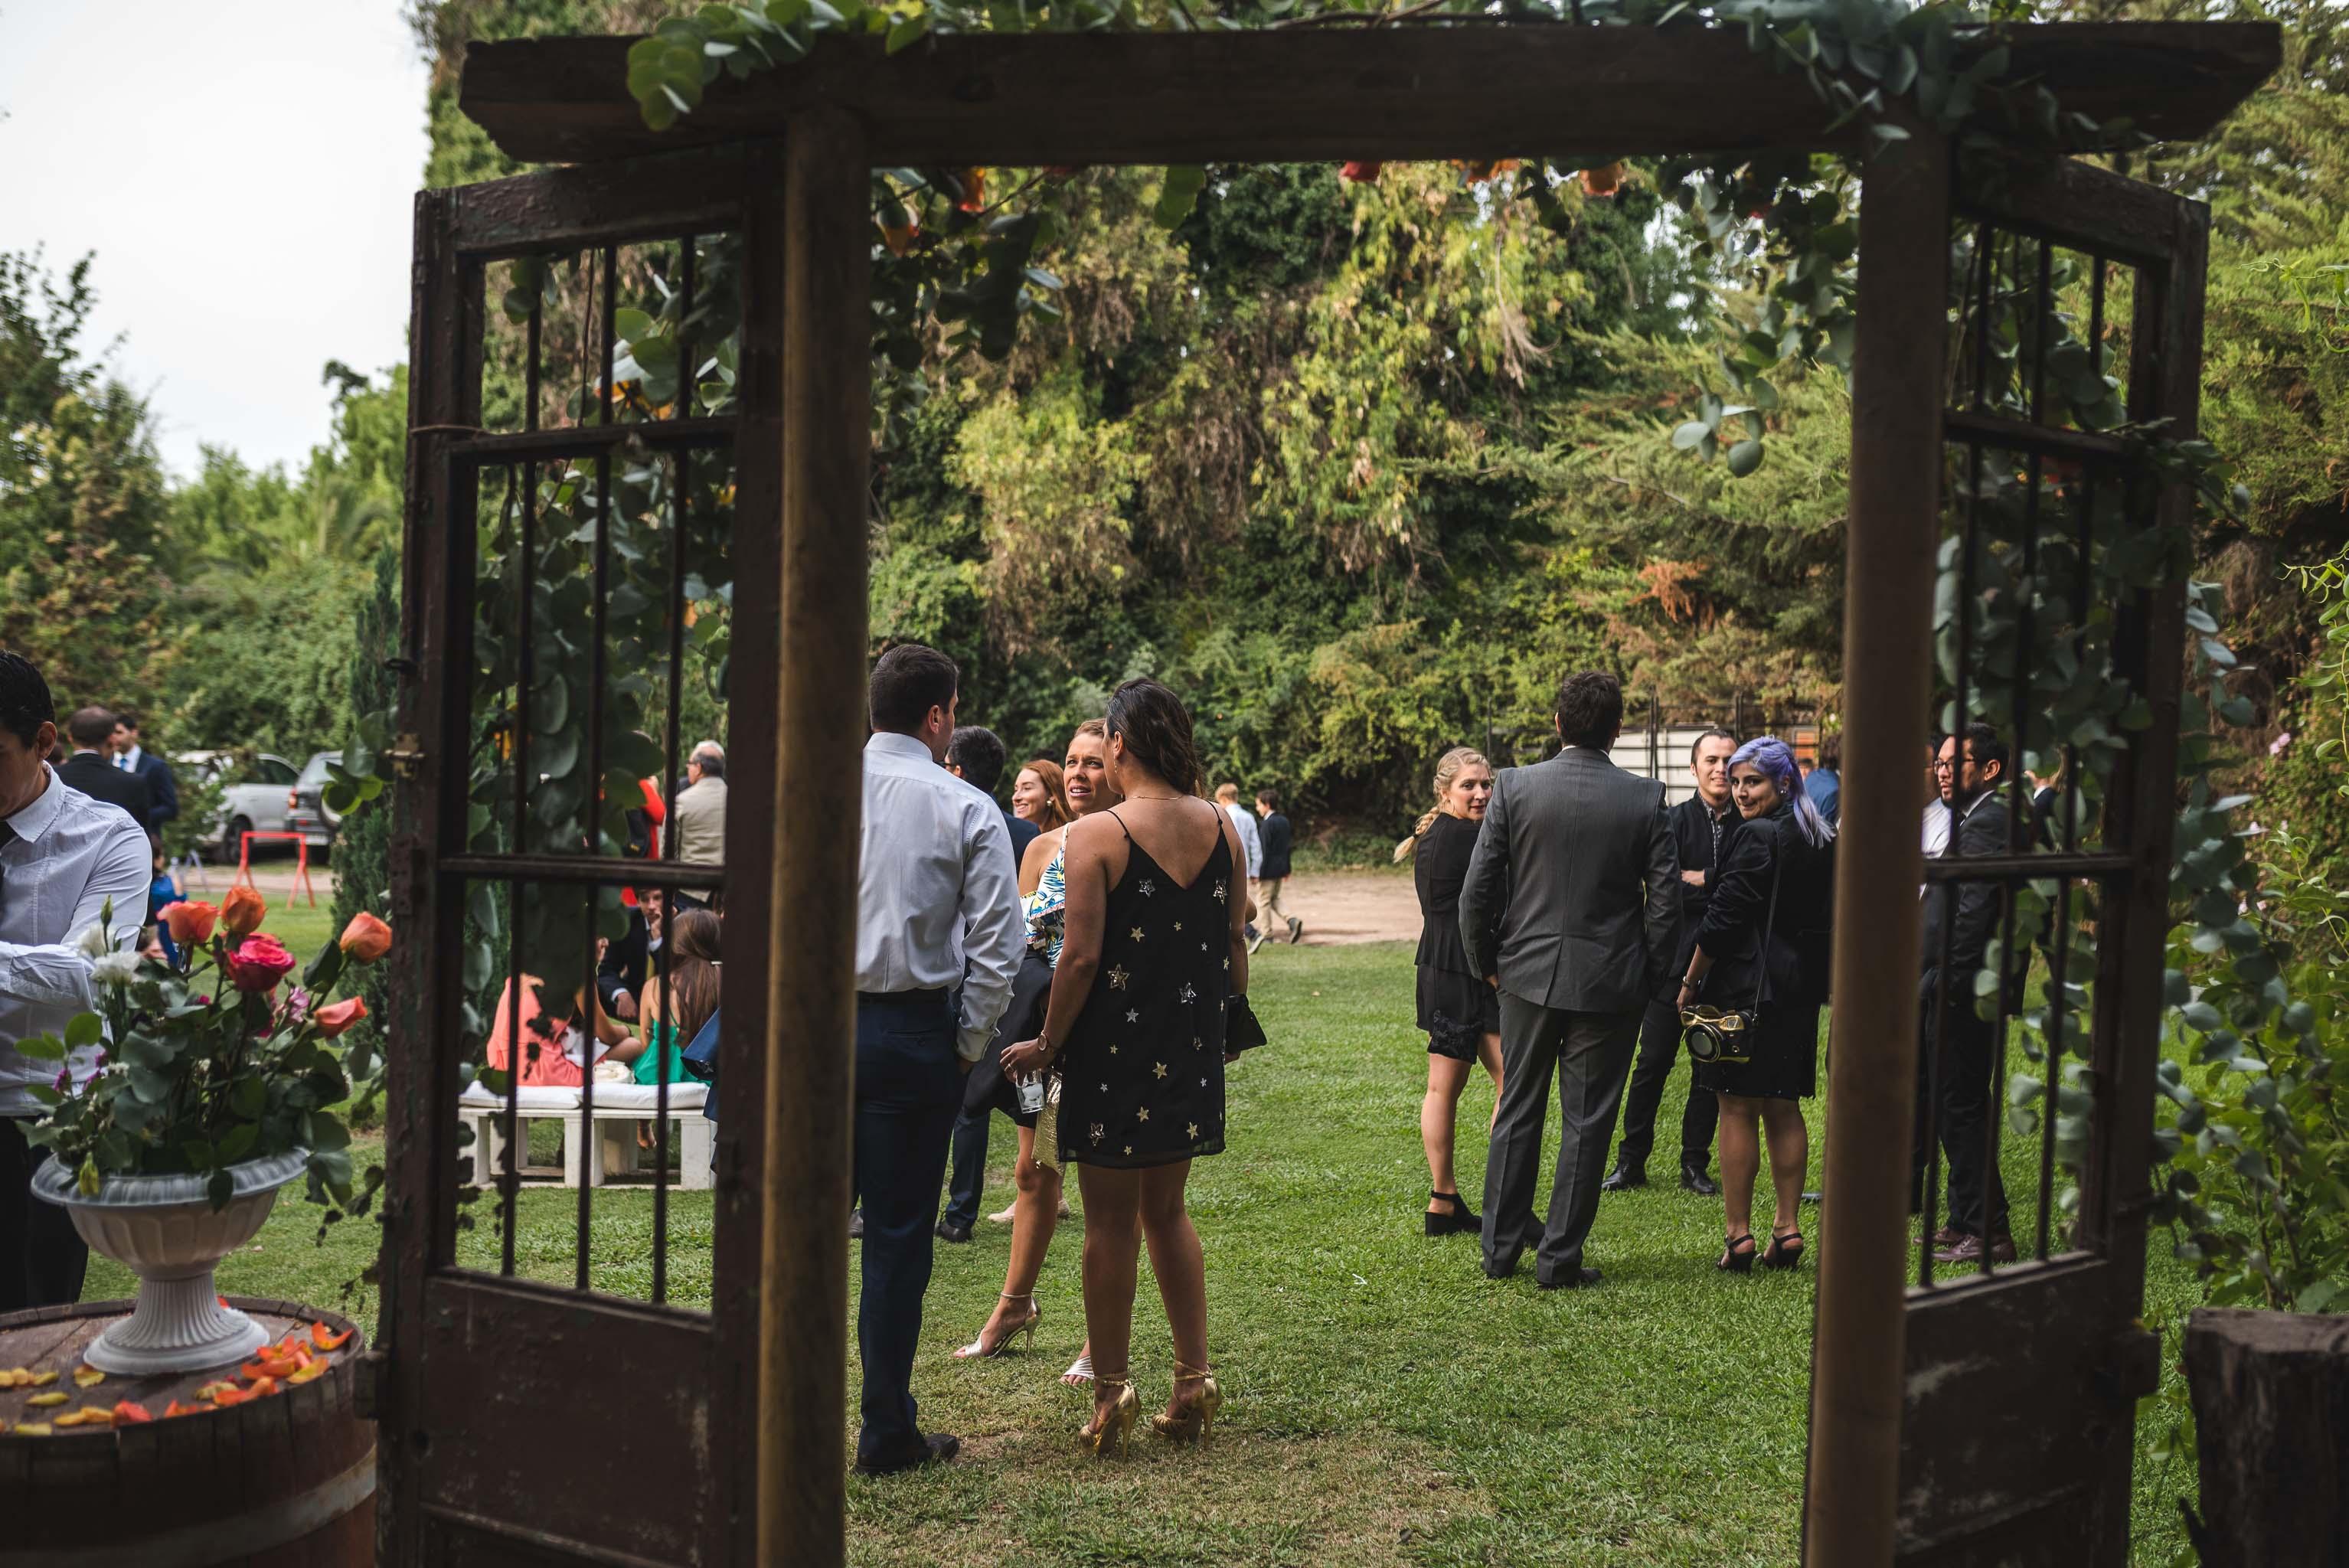 fotografo documental de matrimonios-fotografo matrimonio santiago